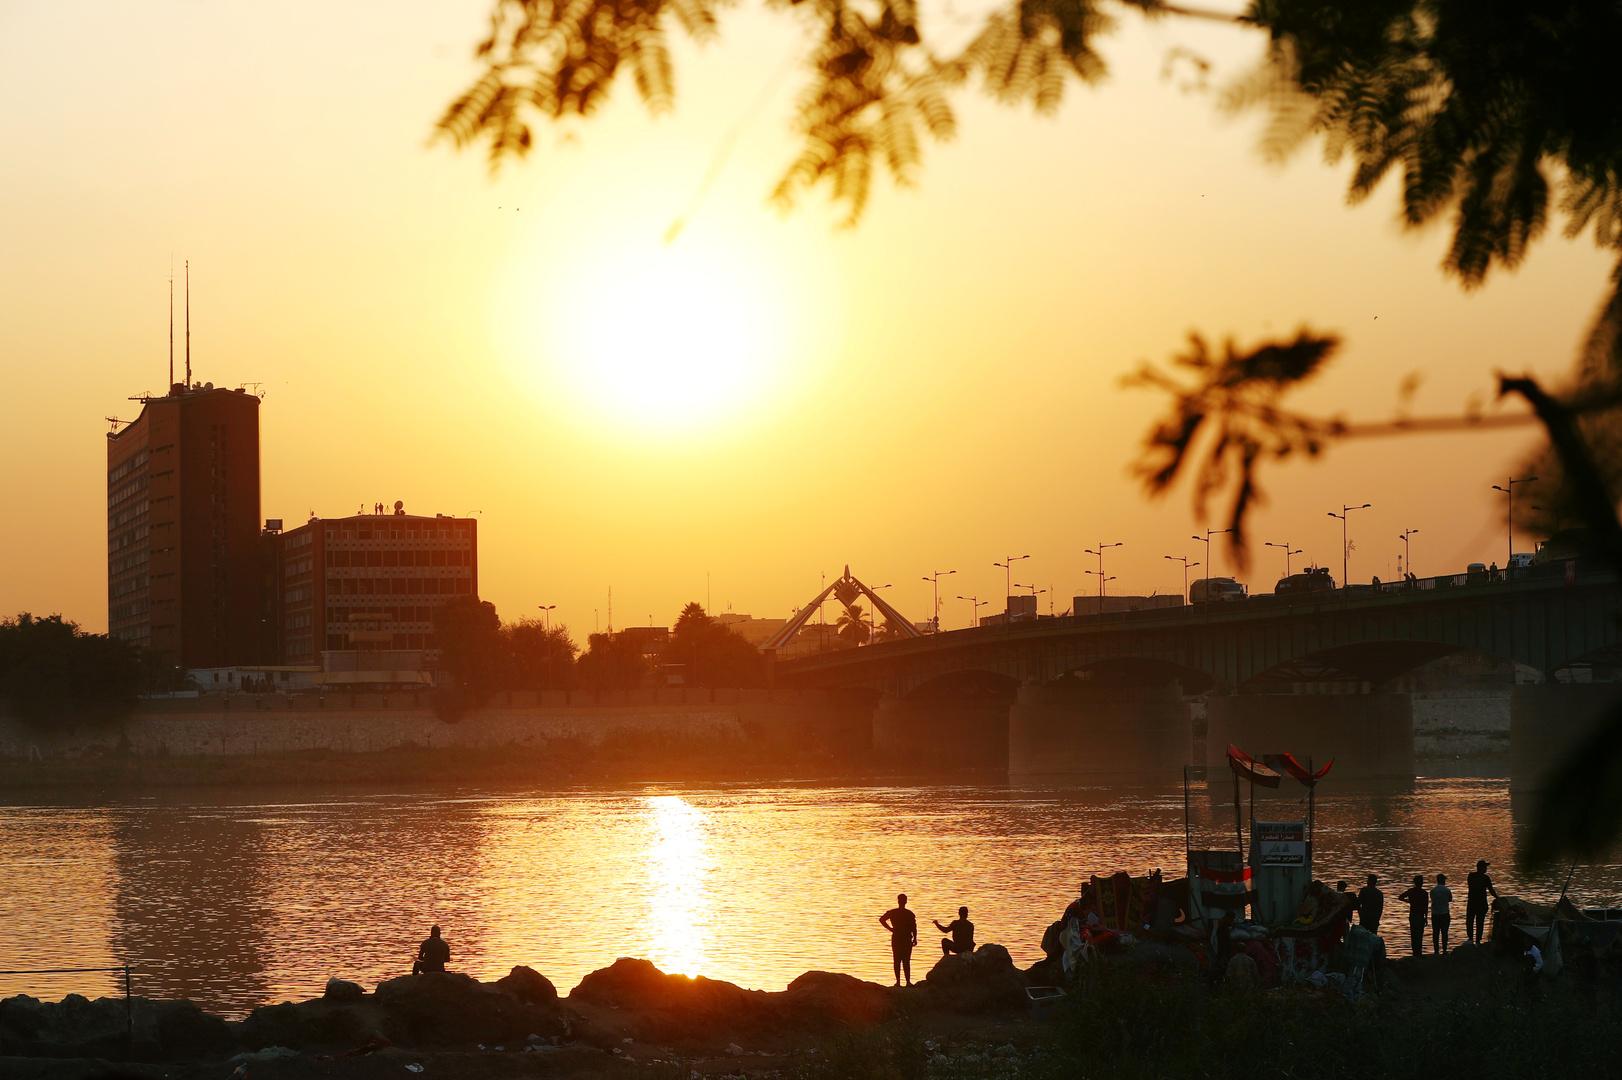 بغداد تكشف عن لقاء عراقي سوري تركي مرتقب و